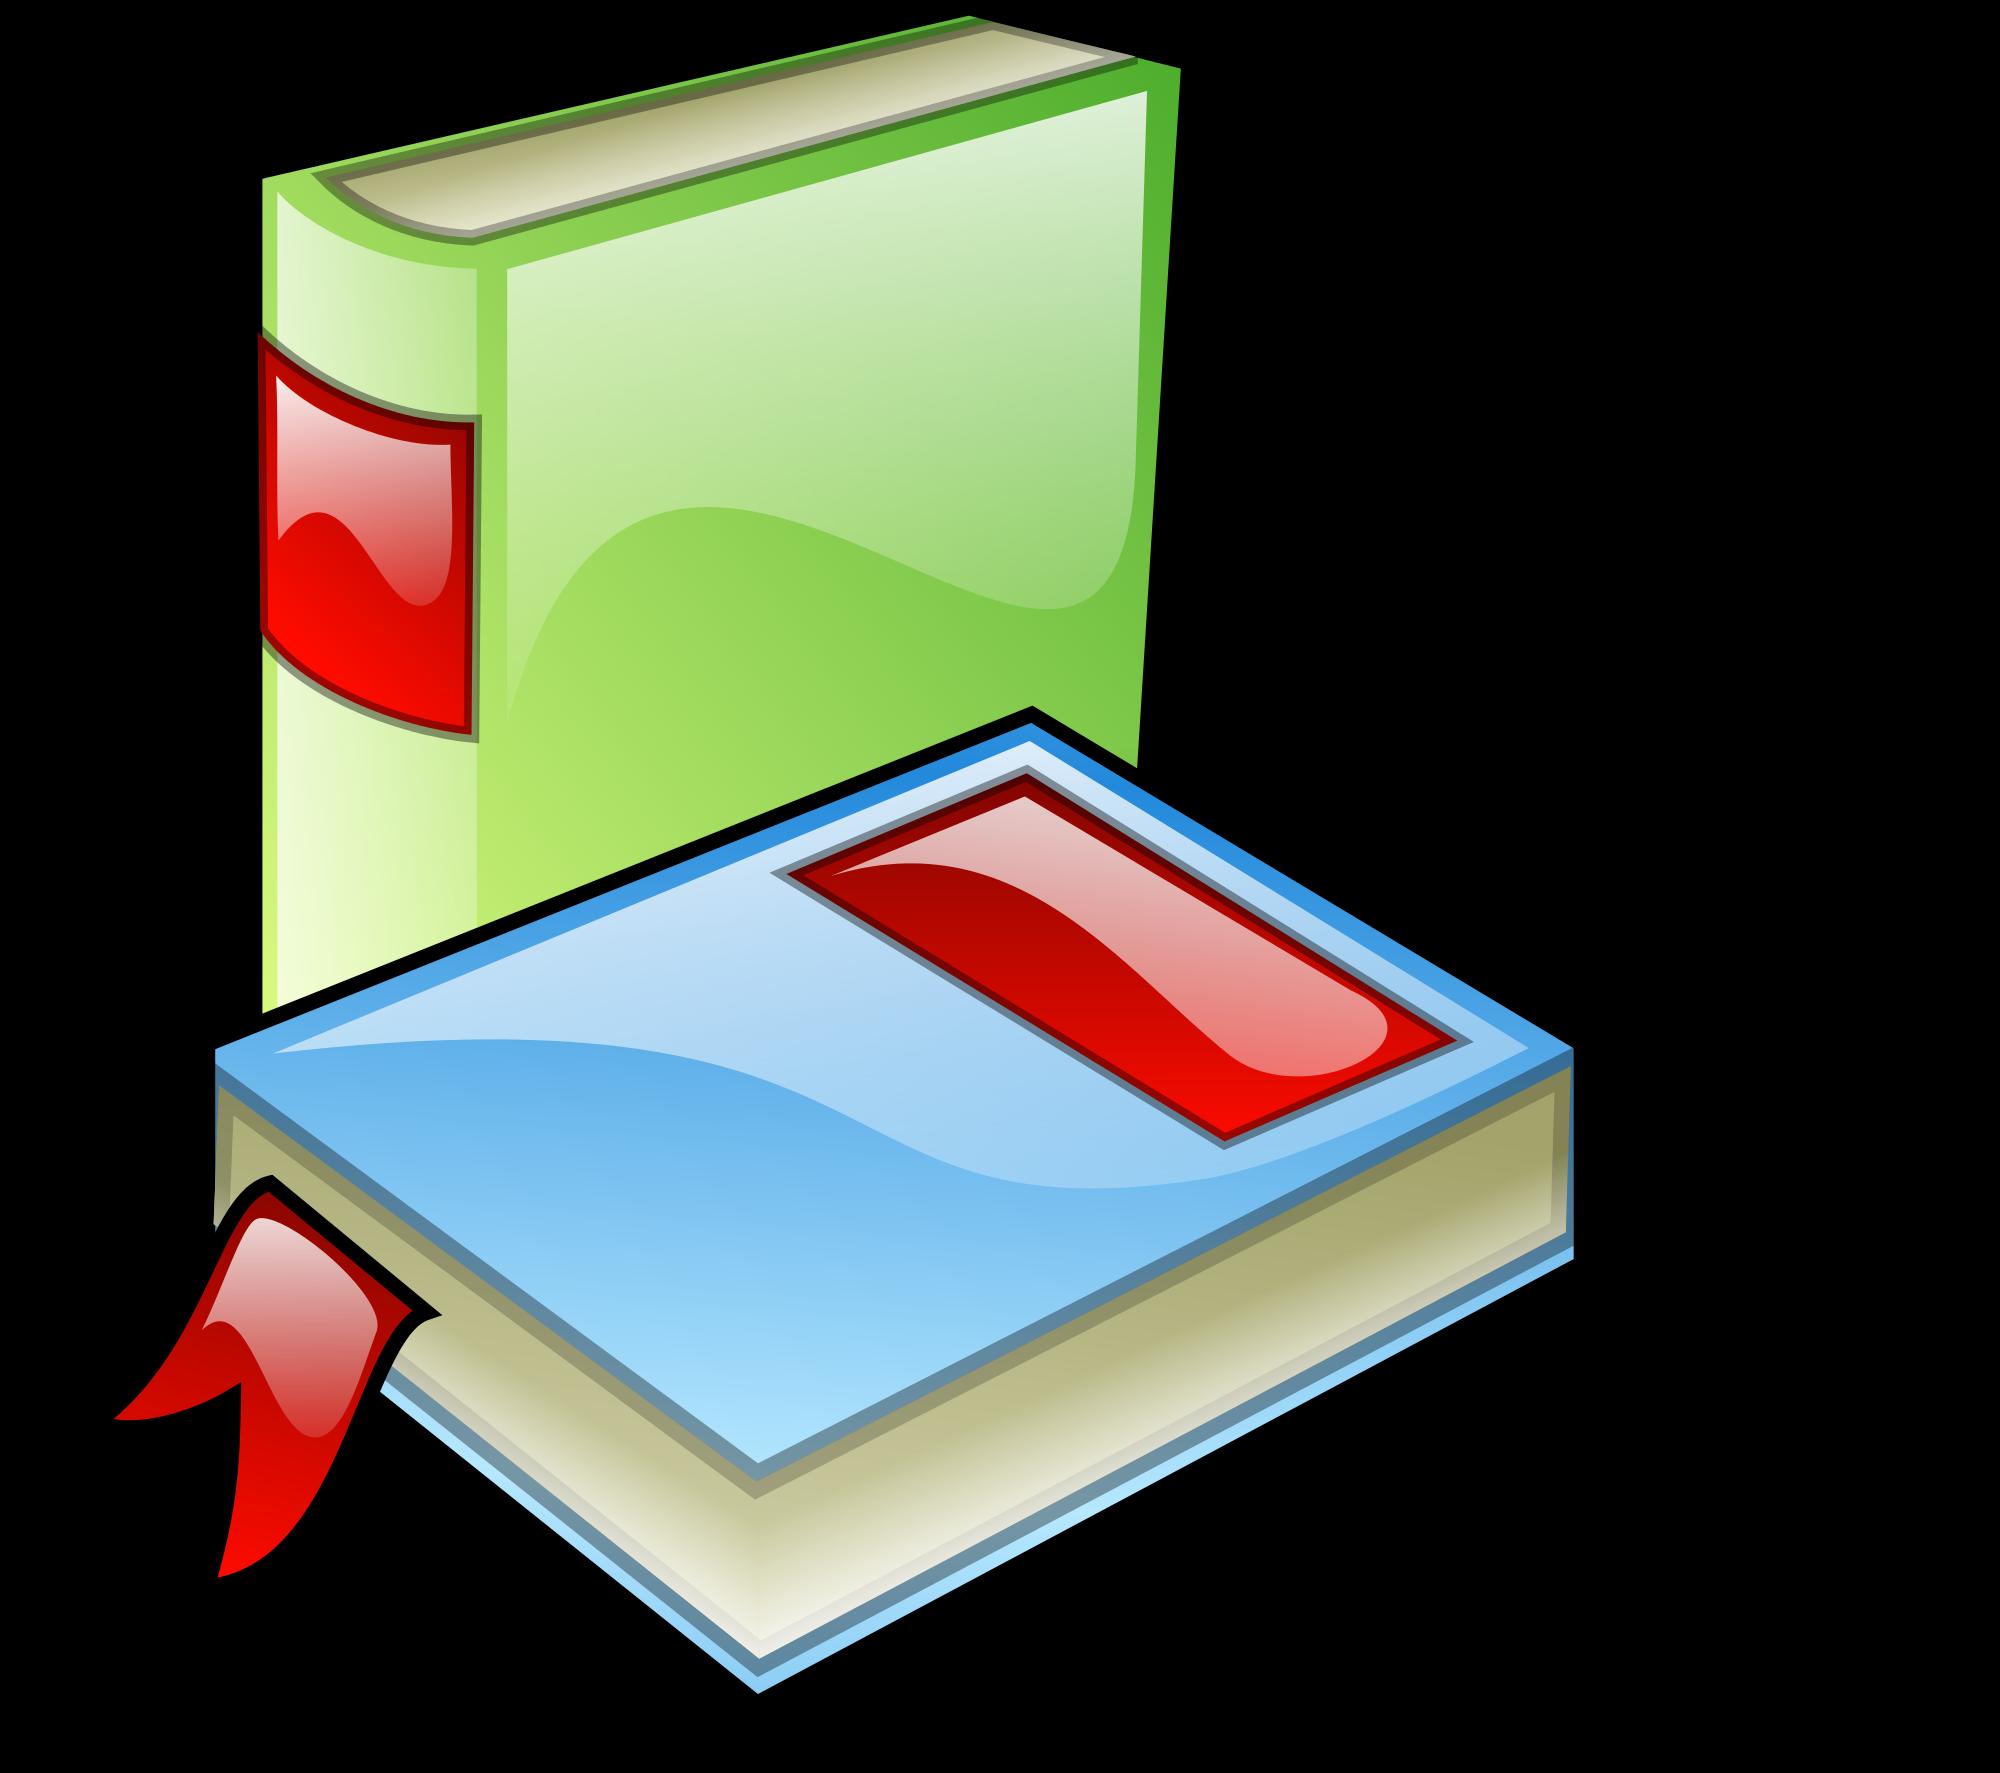 File:Books-aj.svg aj ashton 01.svg - Wikimedia Commons banner library stock